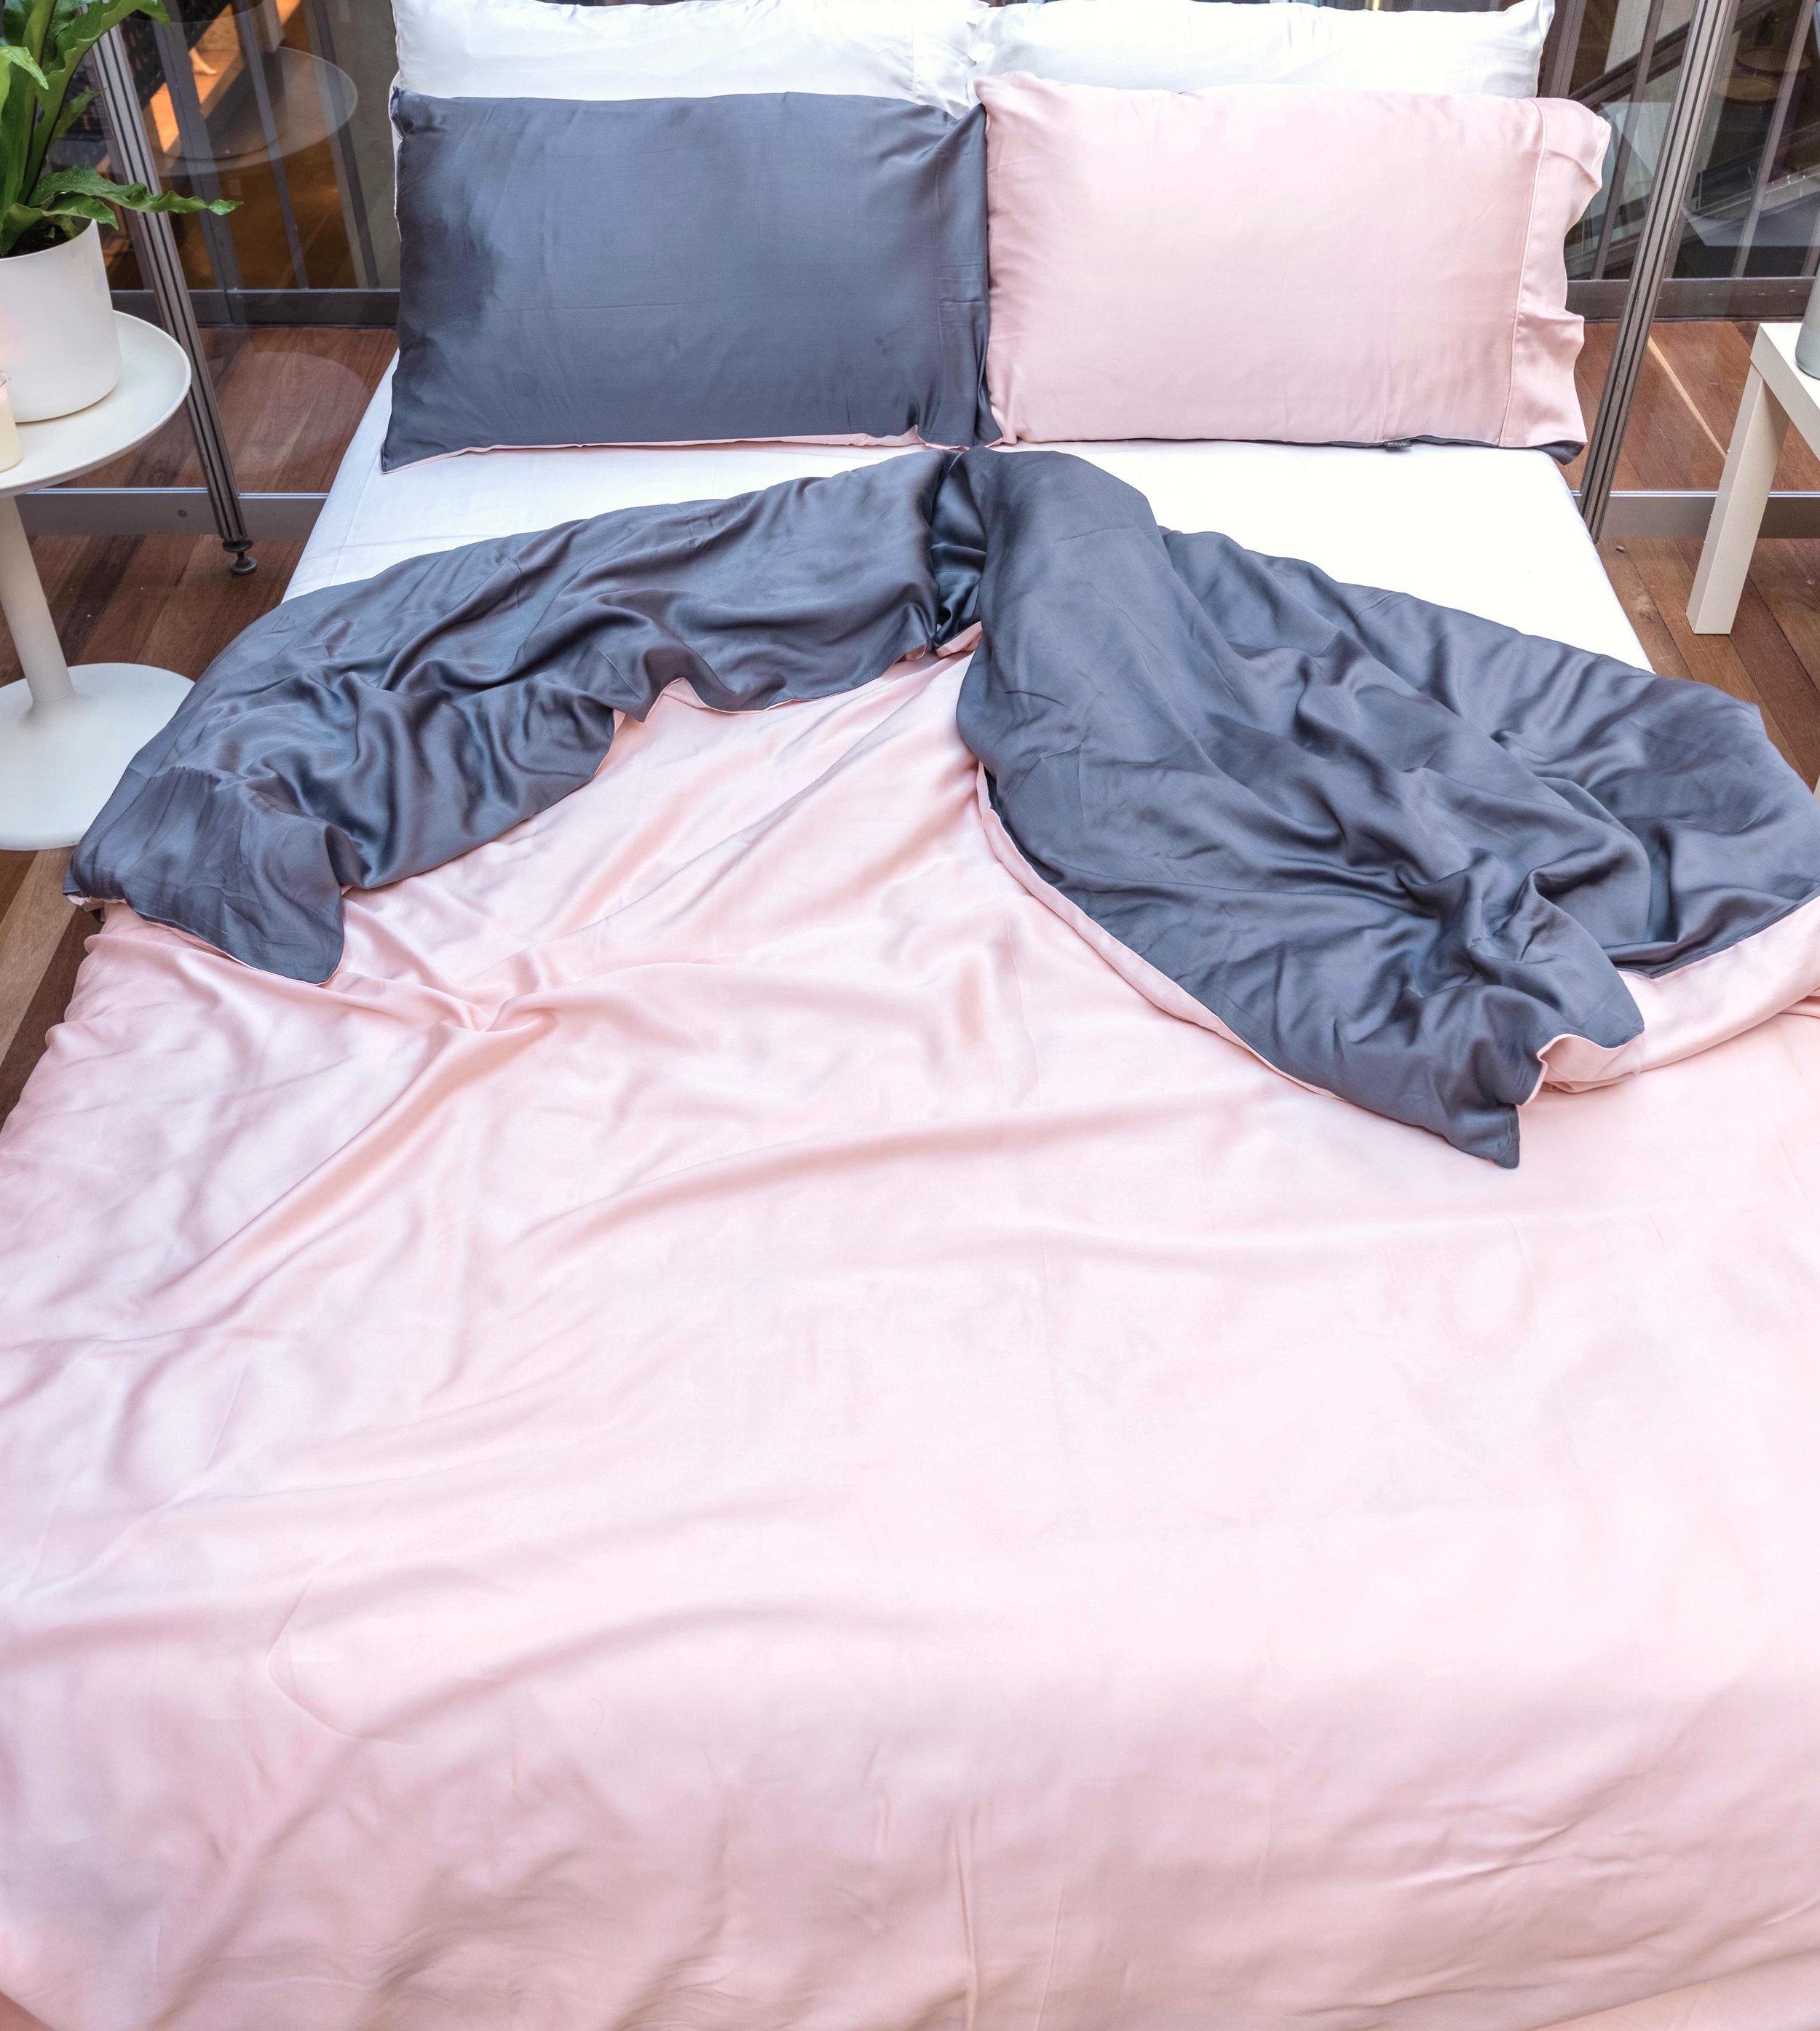 hot top for sleeper products sheets best blush lp sleepers linen parachute sheet